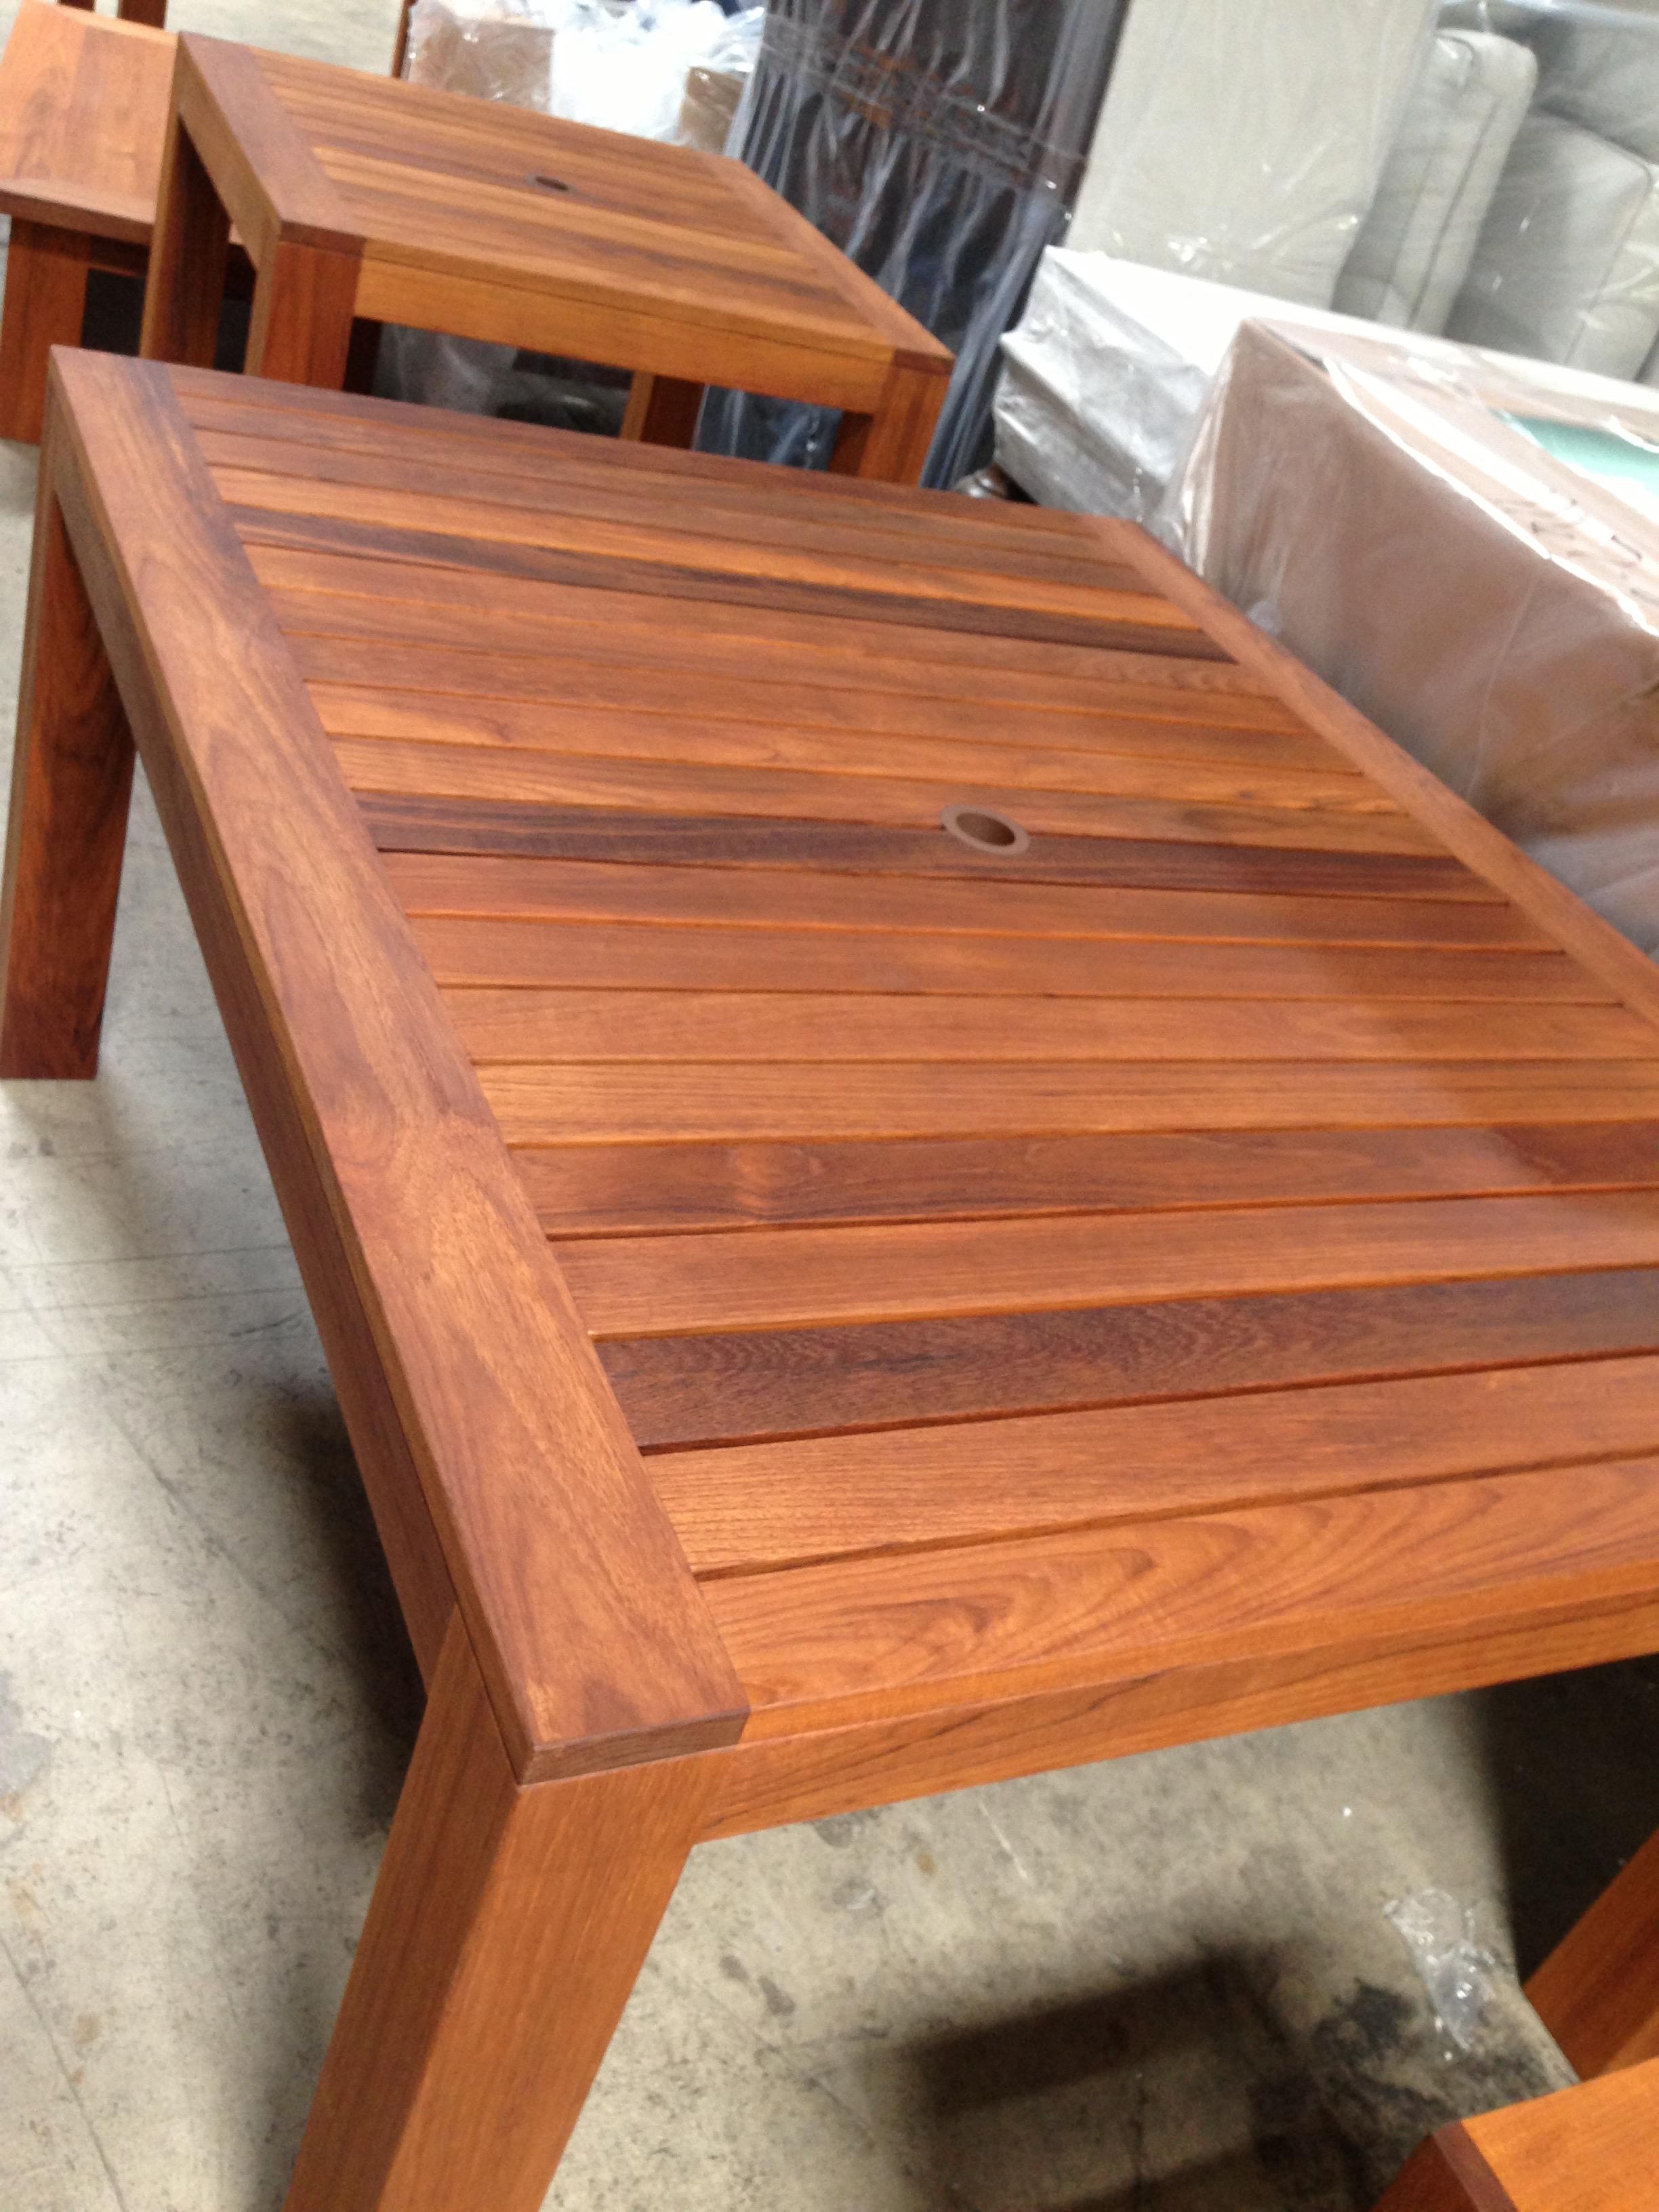 teak furniture img_0708 ... HBYFCZY